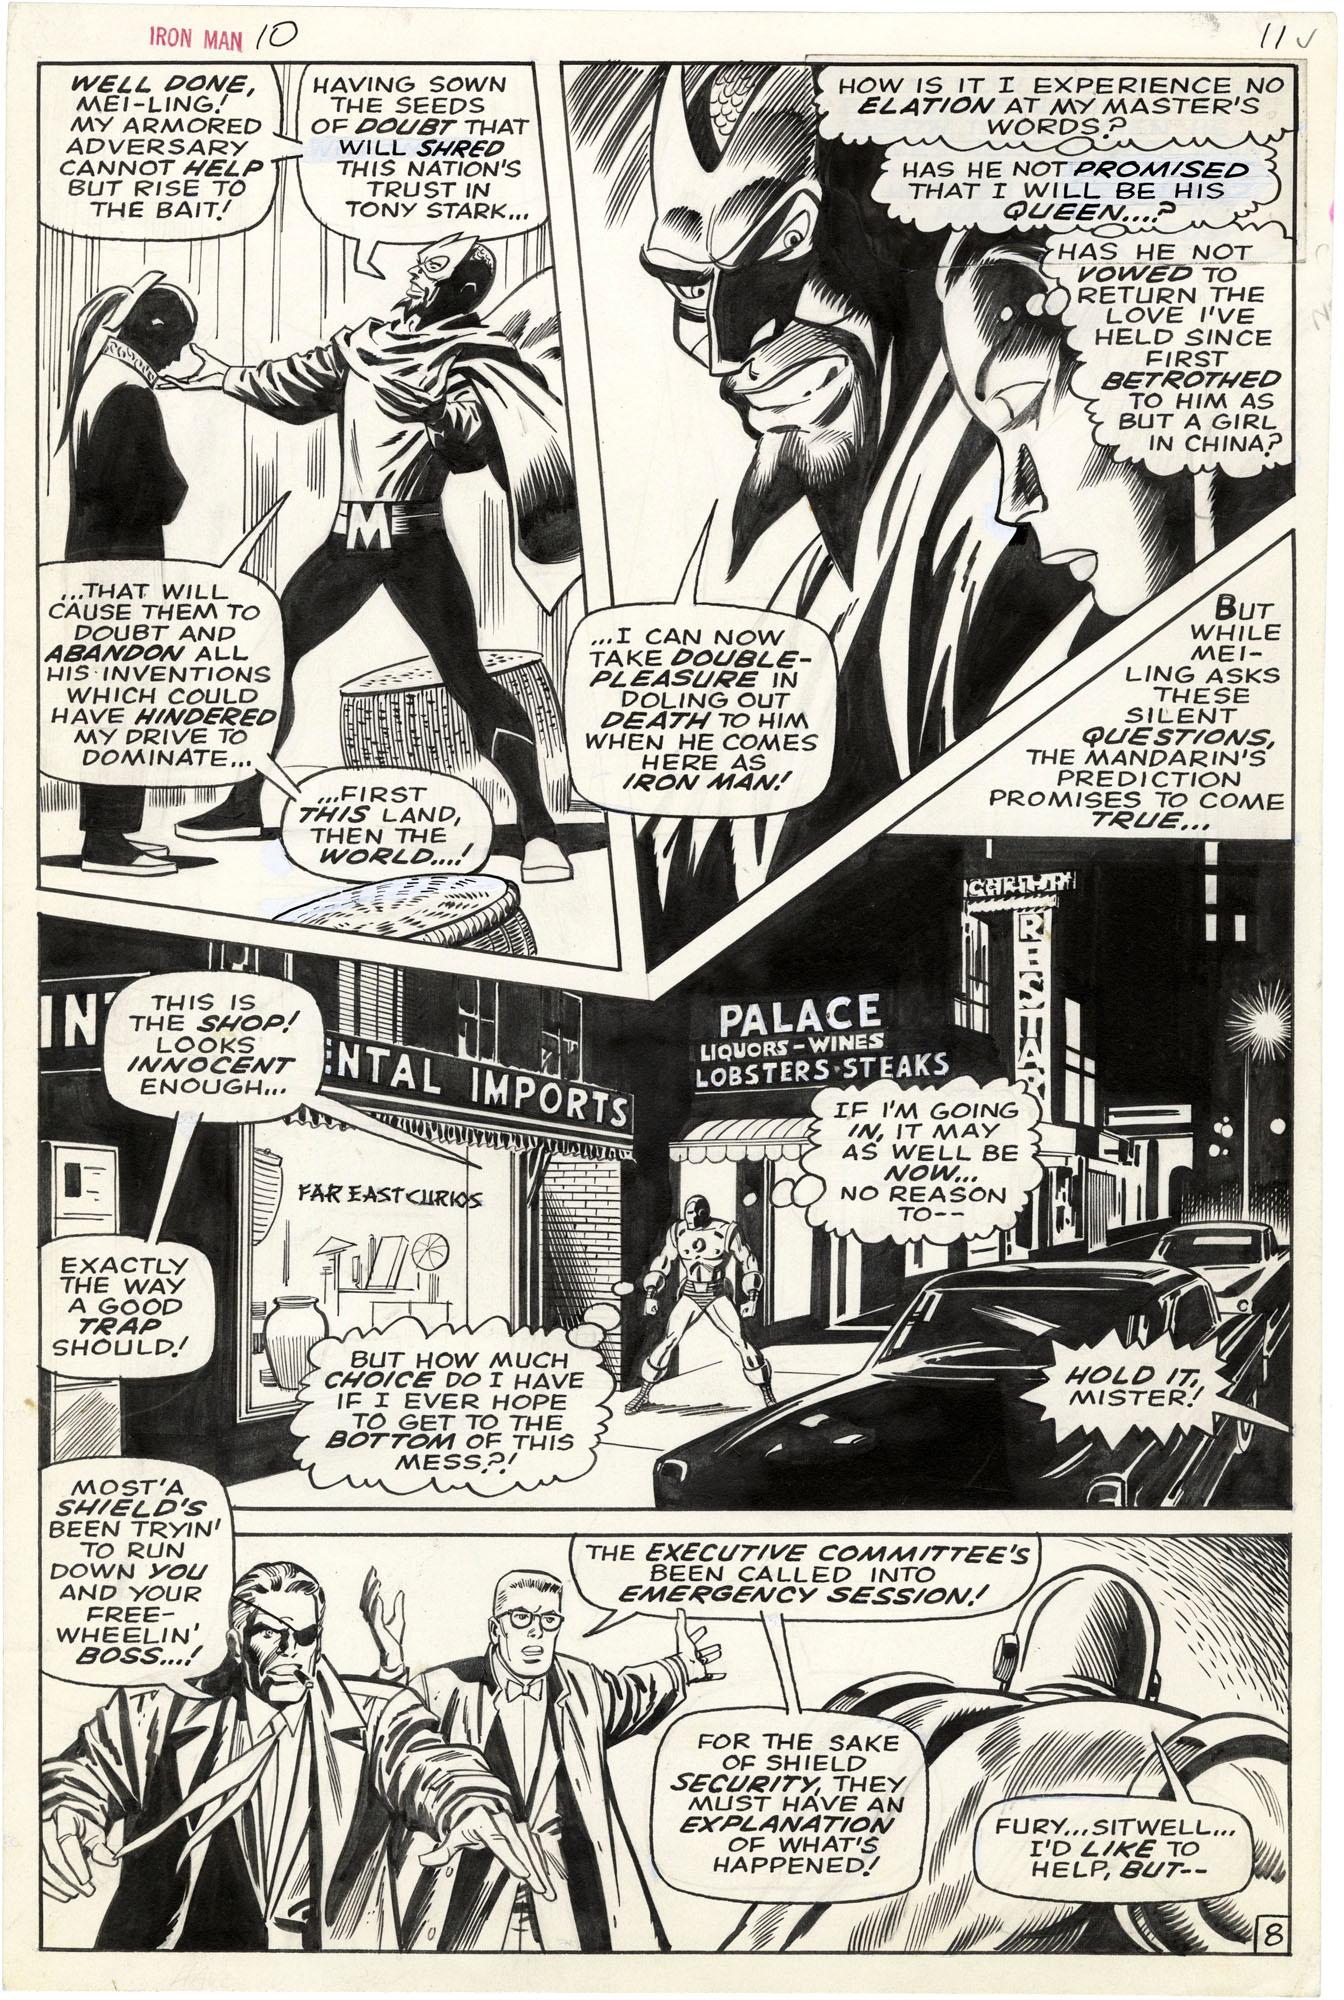 Iron Man #10 p8